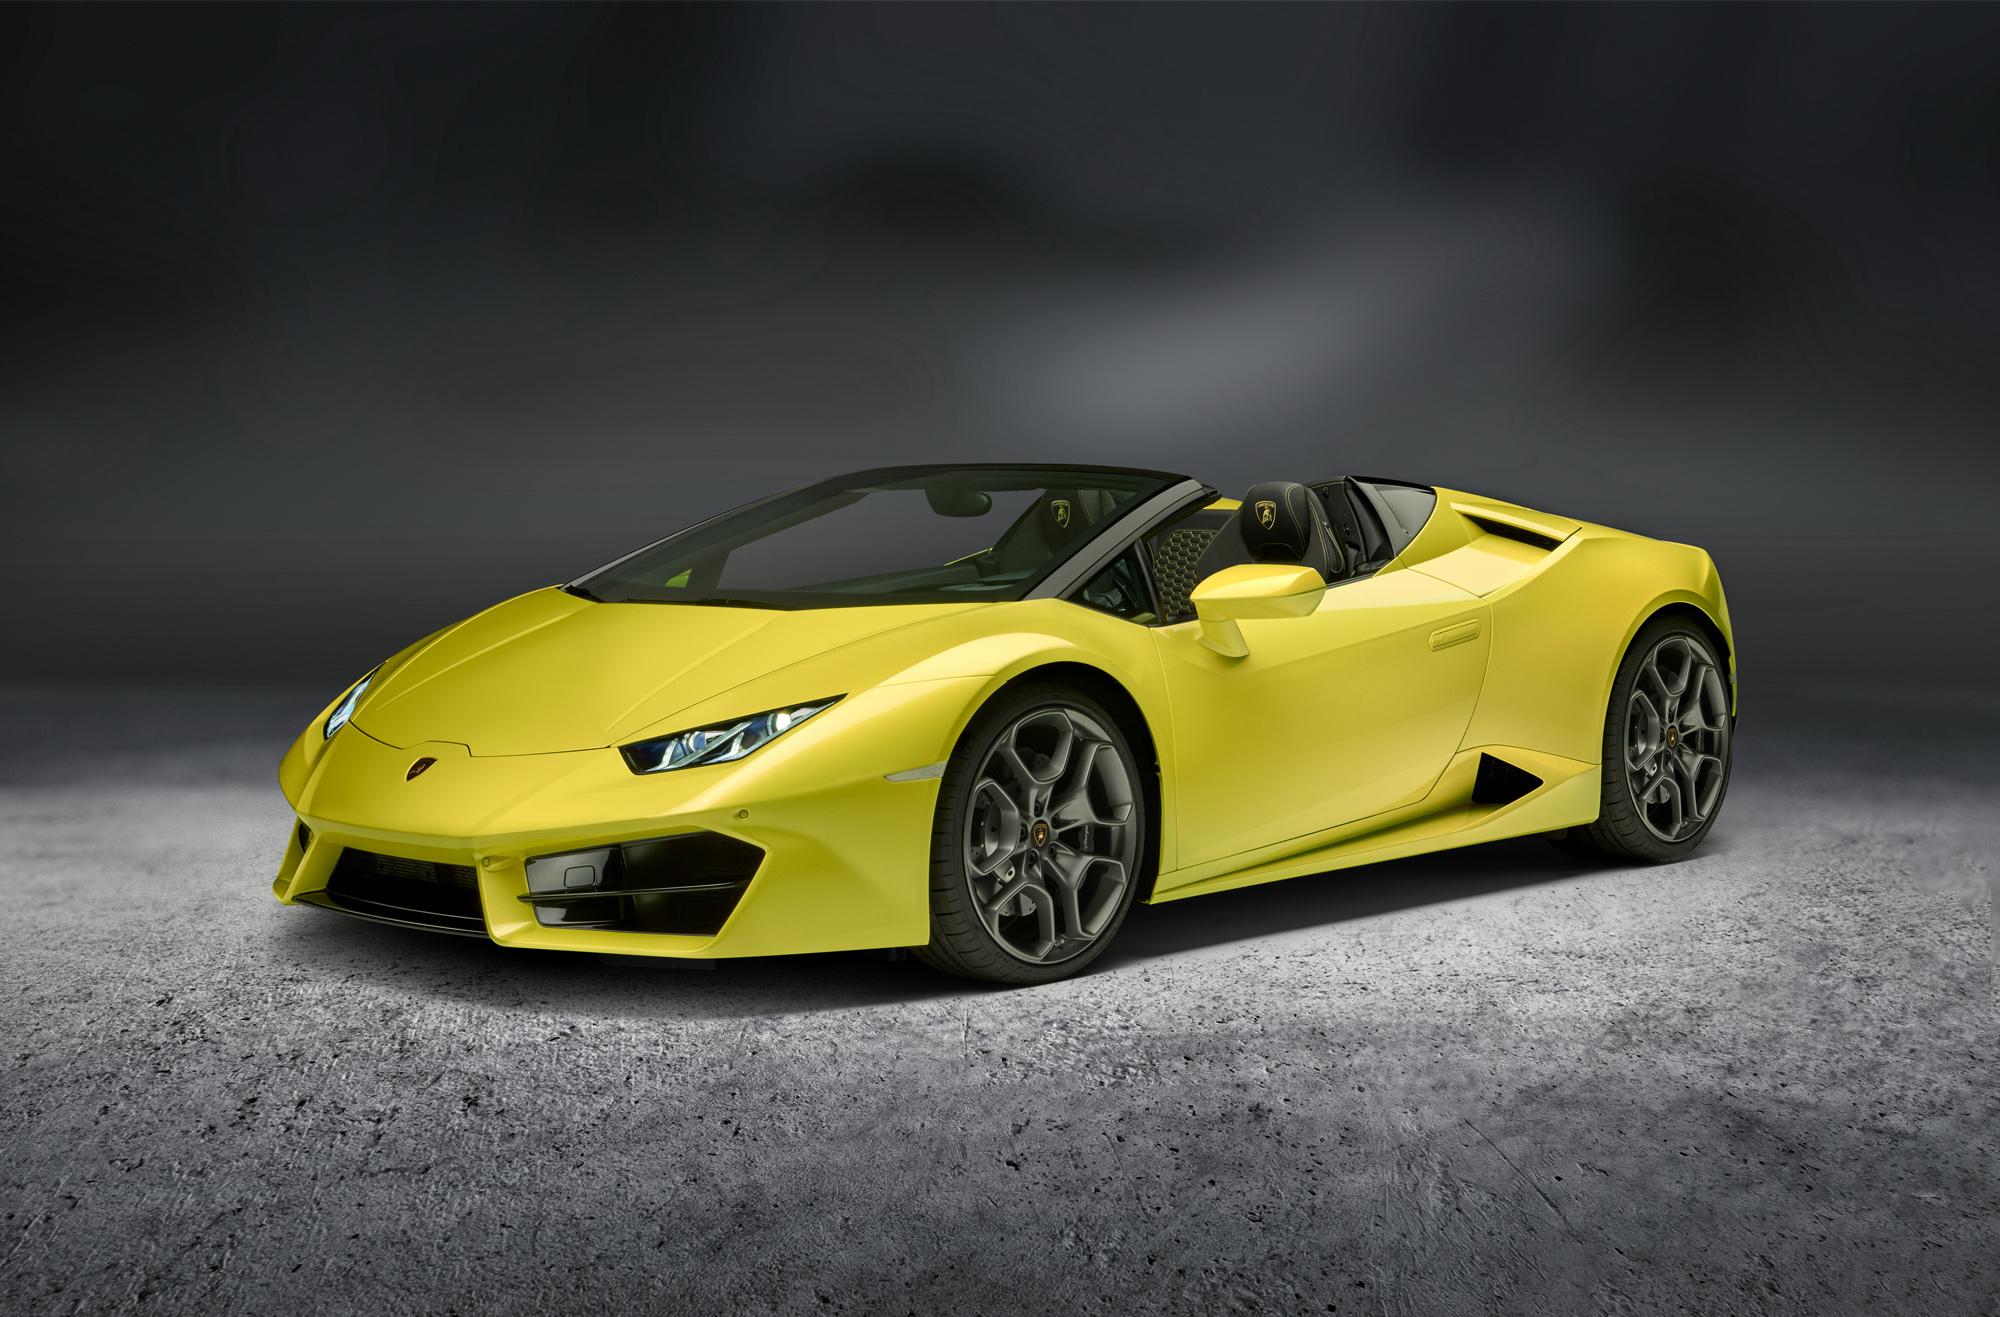 Lamborghini Huracan Rwd Spyder Wallpapers